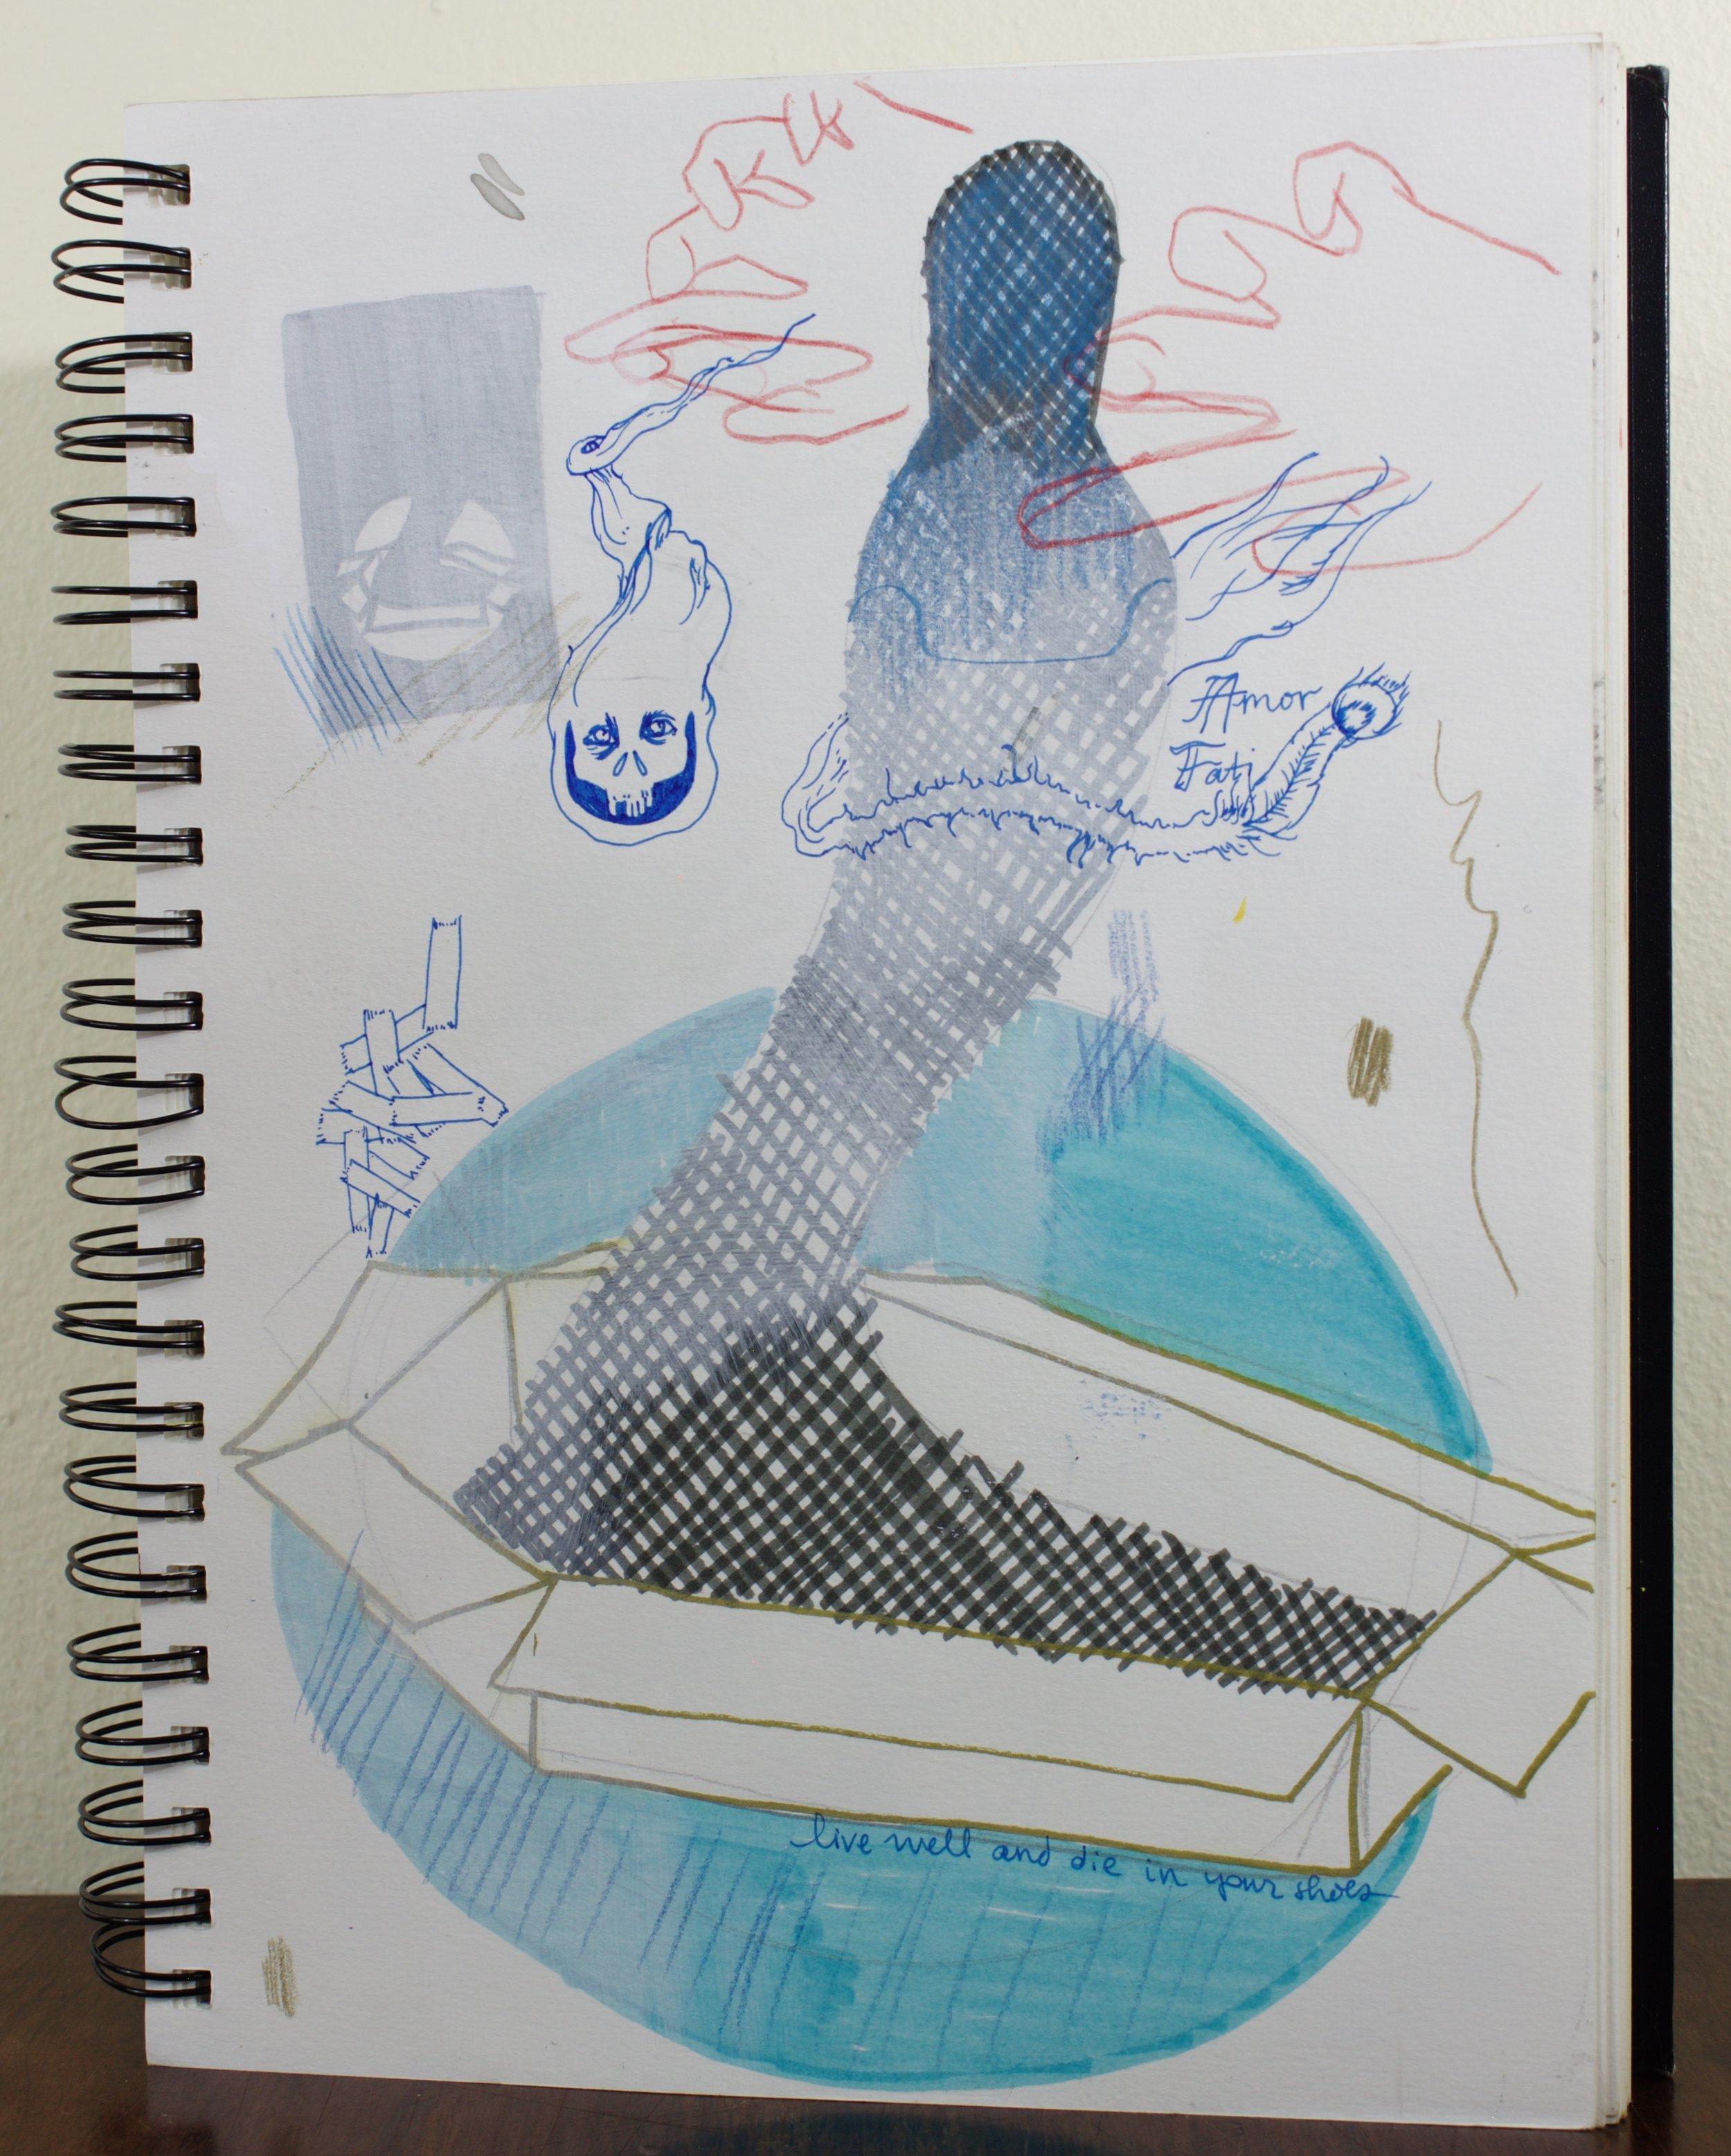 sketch for Cardboard Coffin prints